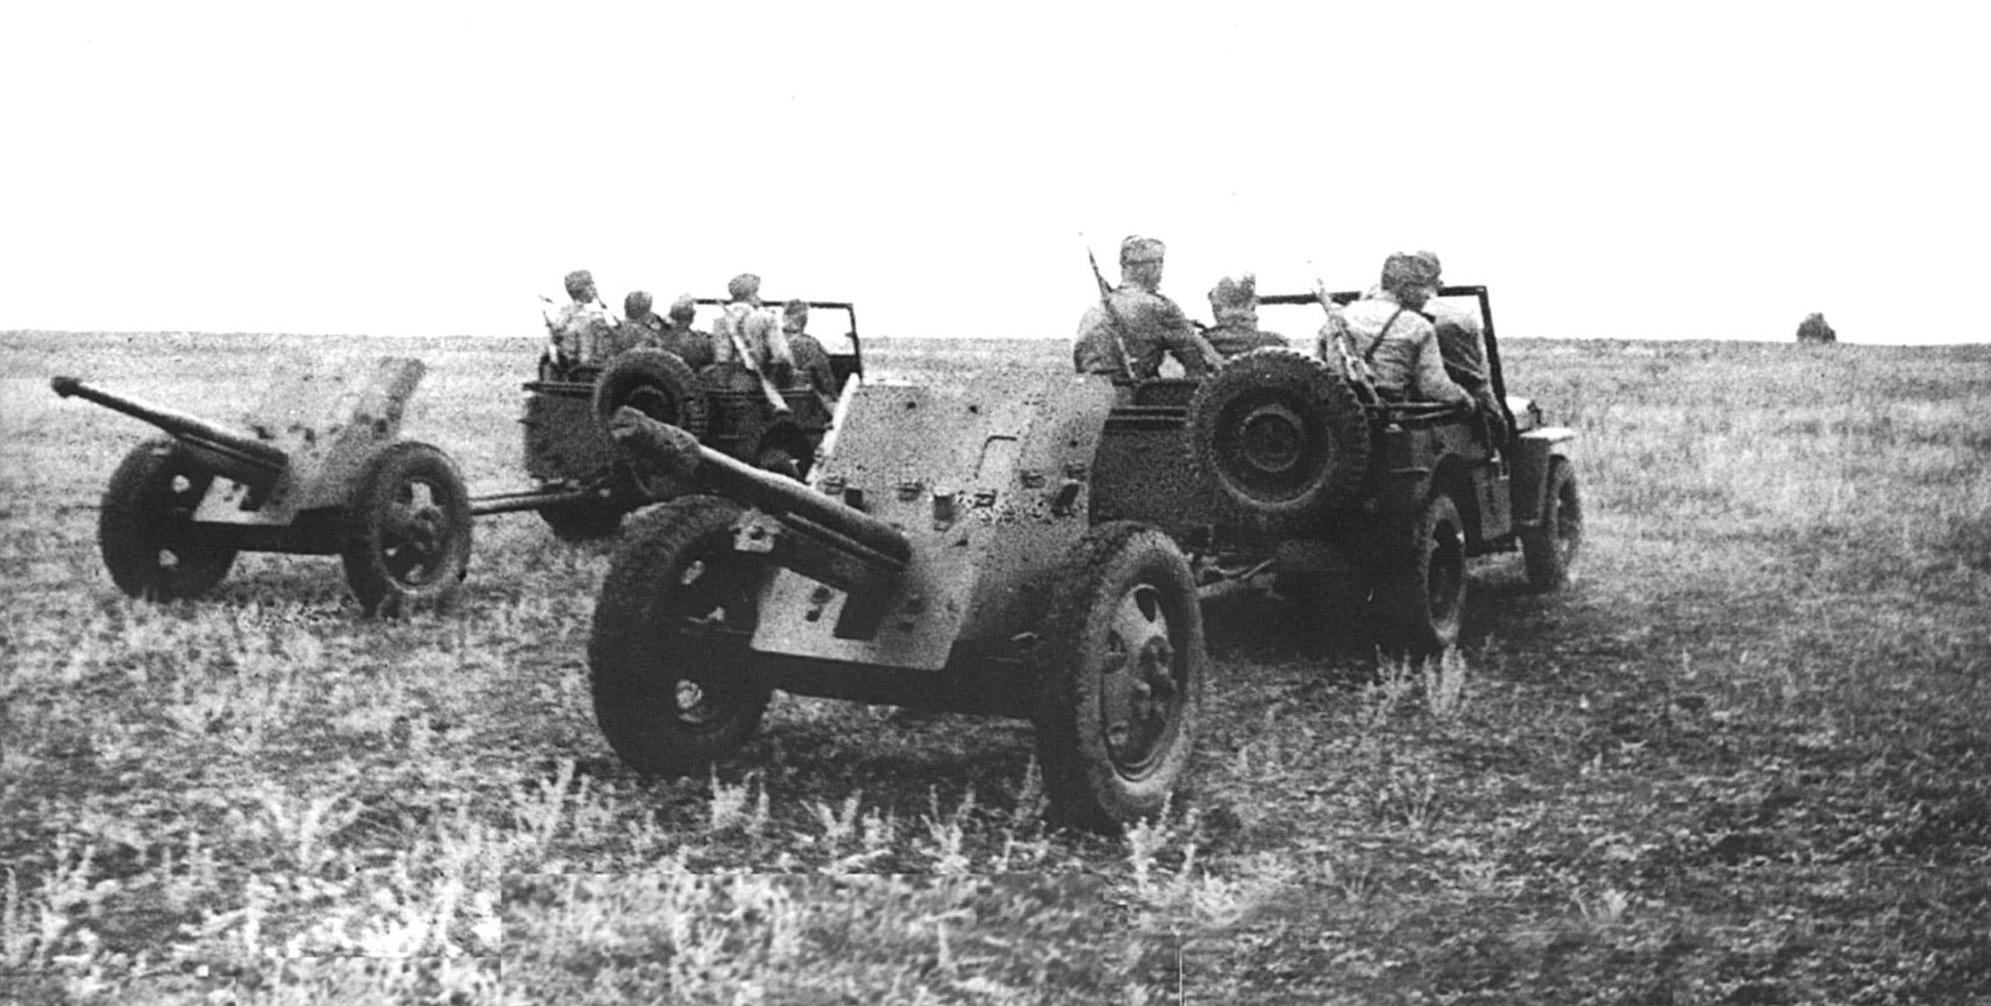 Джипы Виллис буксируют 45-мм противотанковые пушки